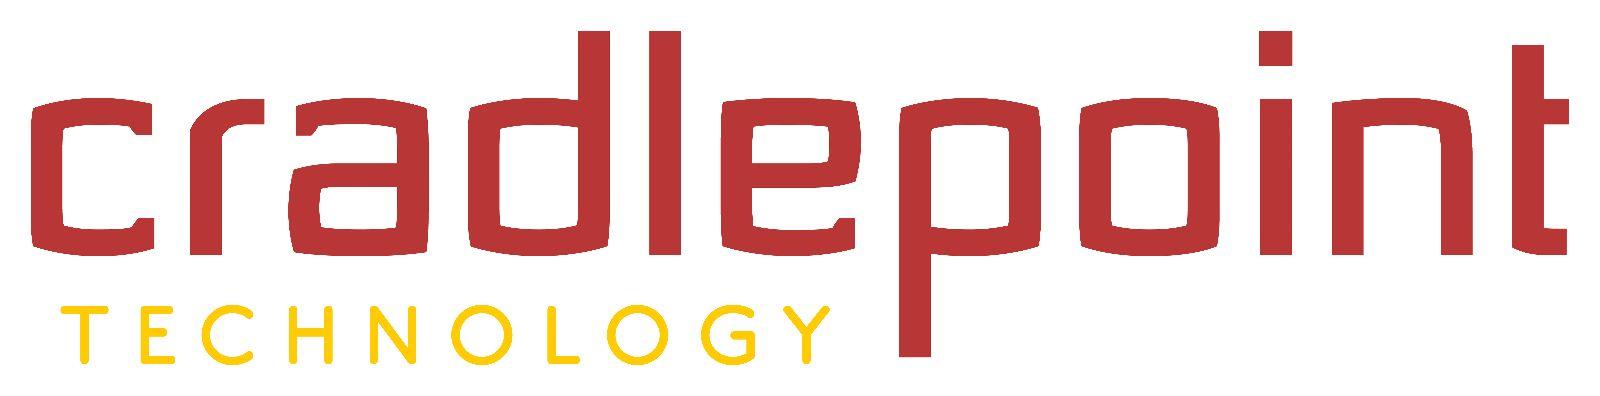 CradlePoint_Logo1.jpg